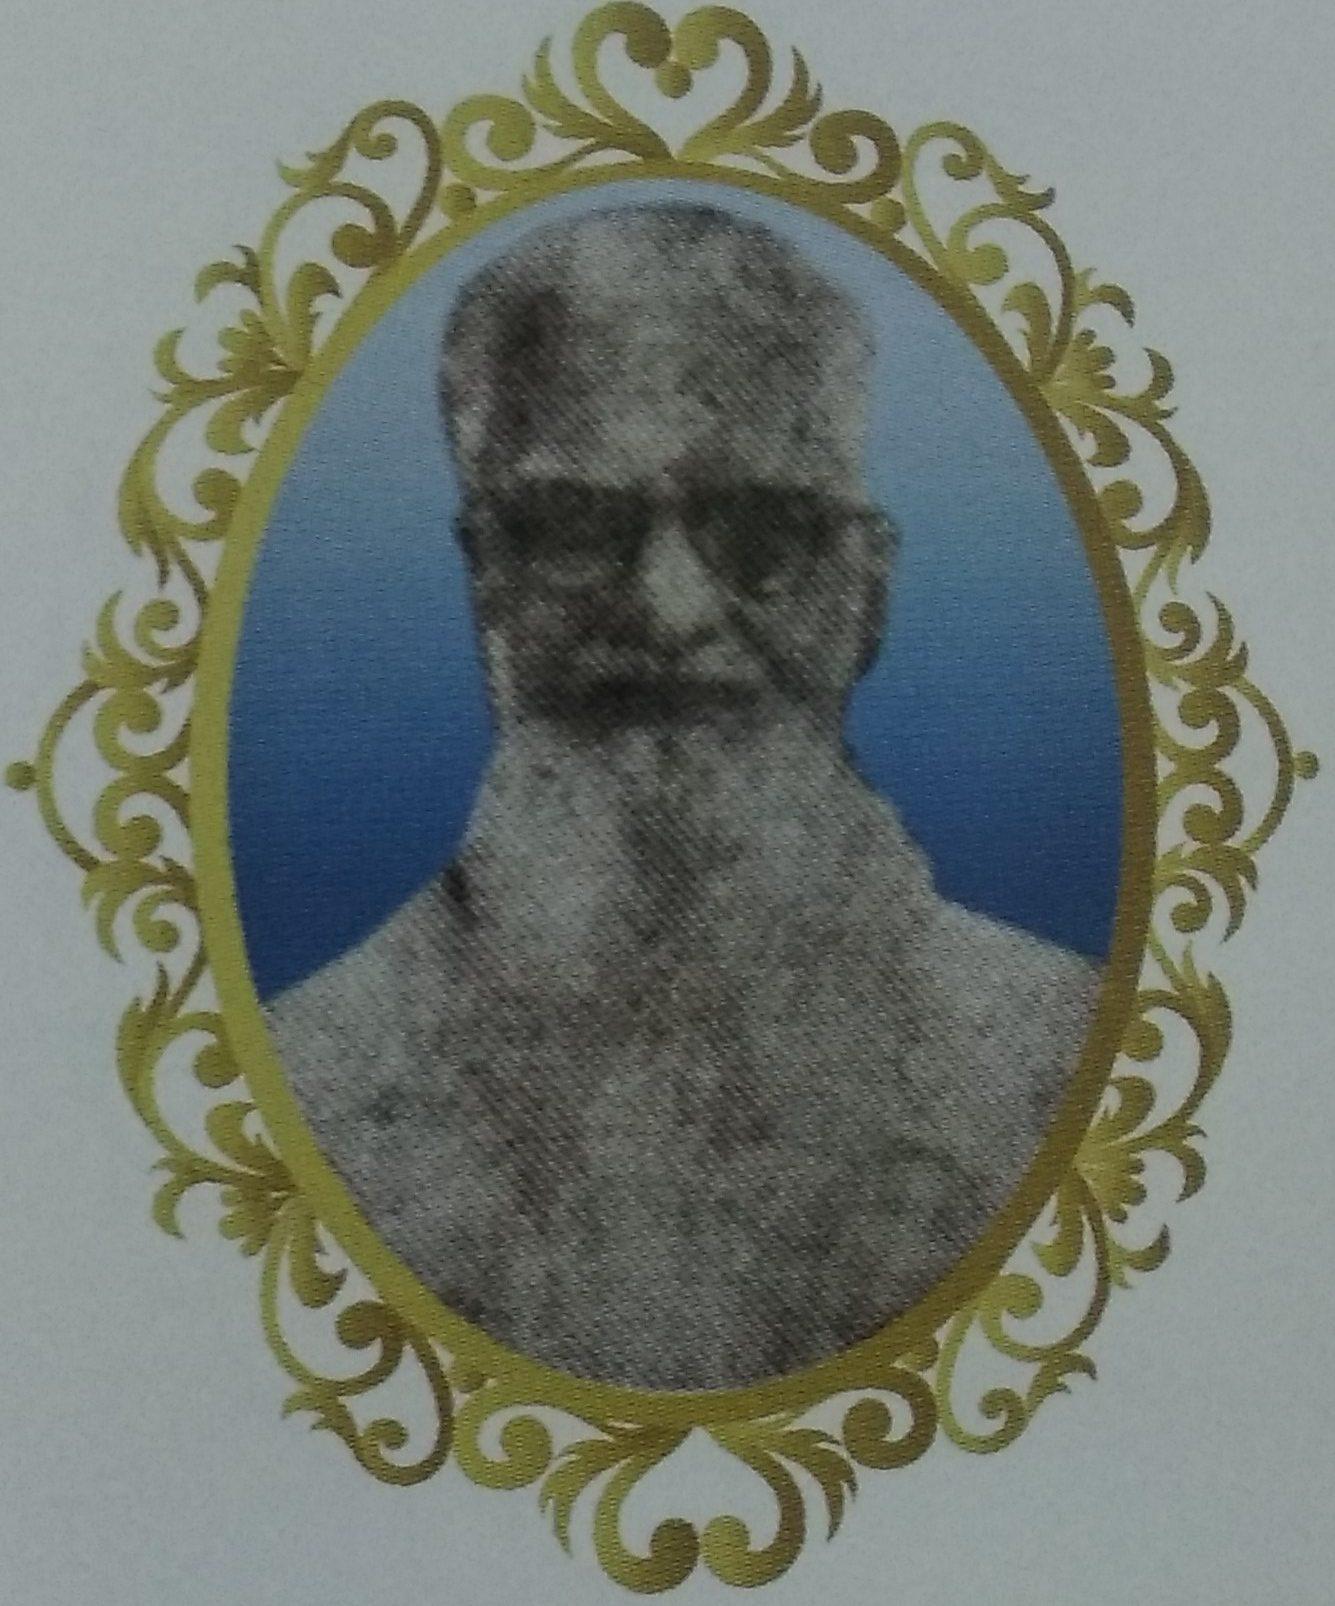 Fr. Sebastian Pattamana